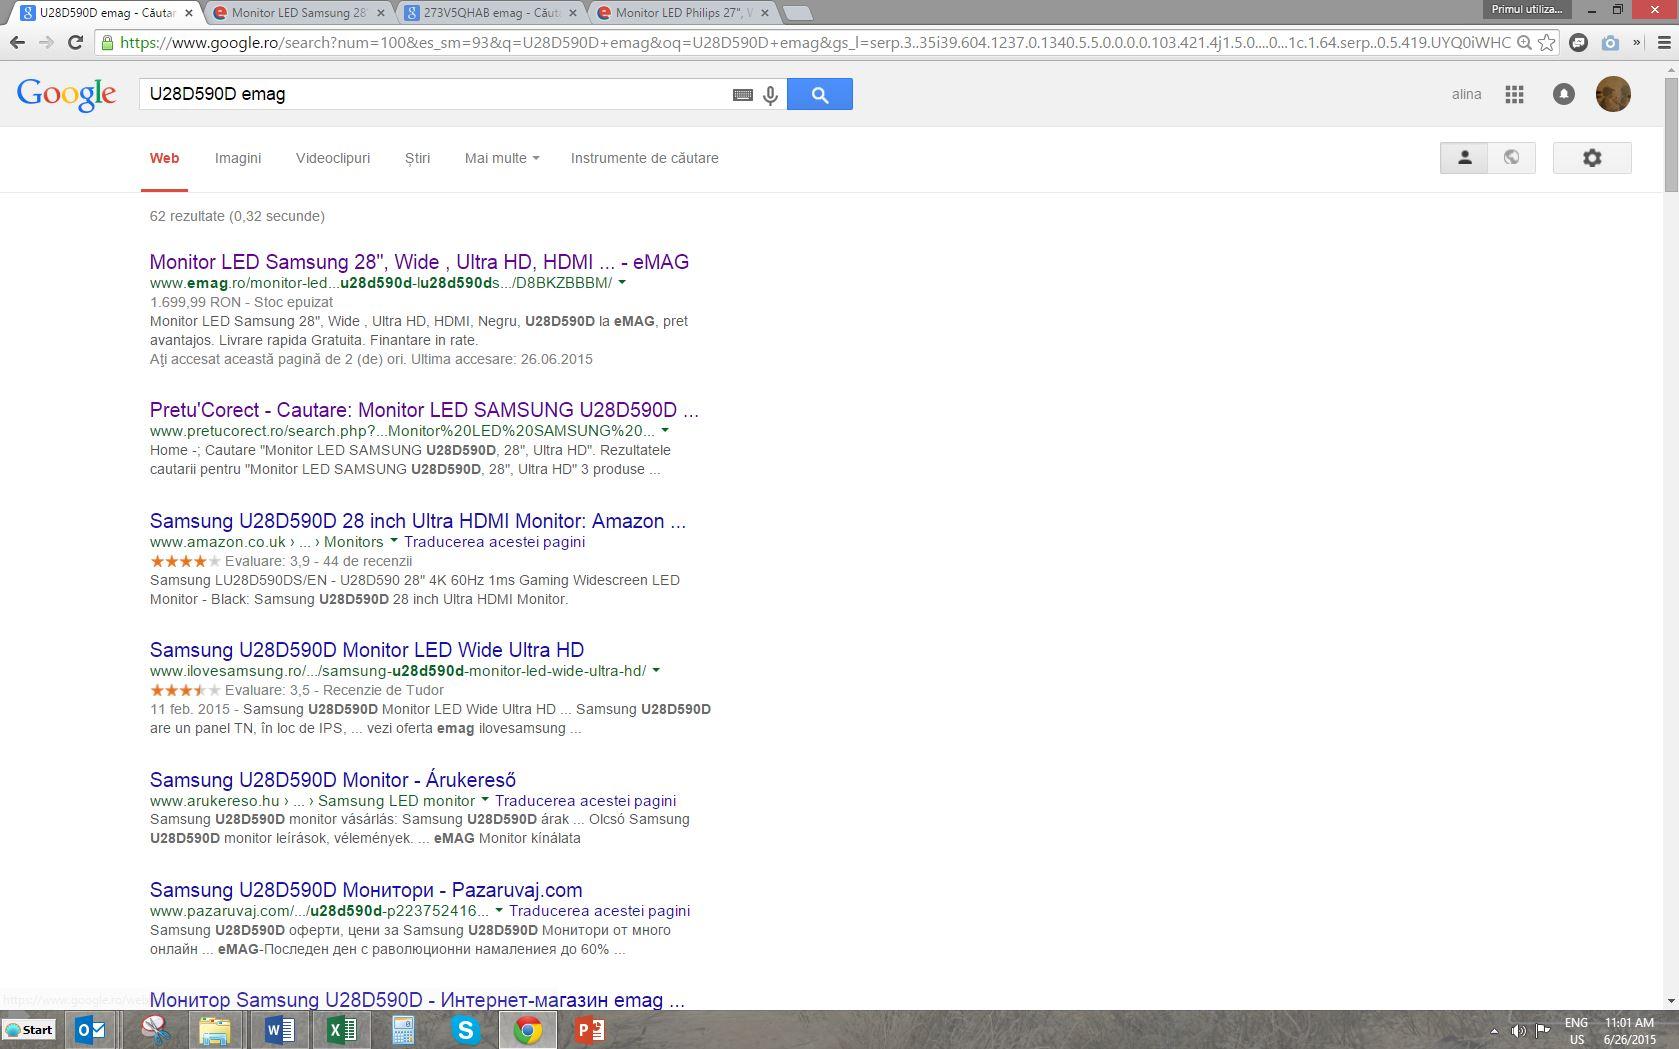 Cautare Google - monitor Samsung U28D590D eMAG